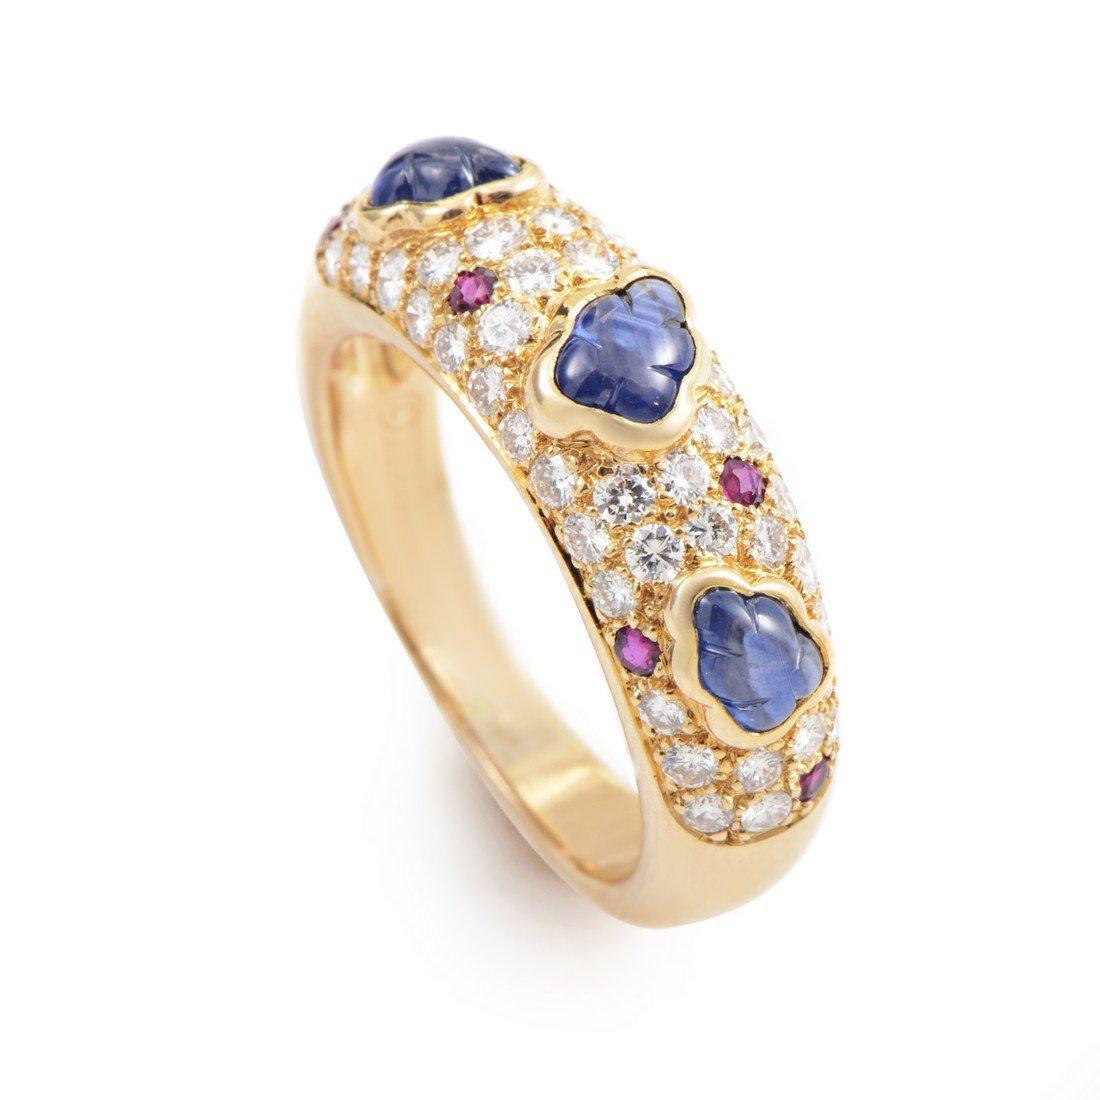 Cartier 18K Yellow Gold Precious Gemstone Band Ring